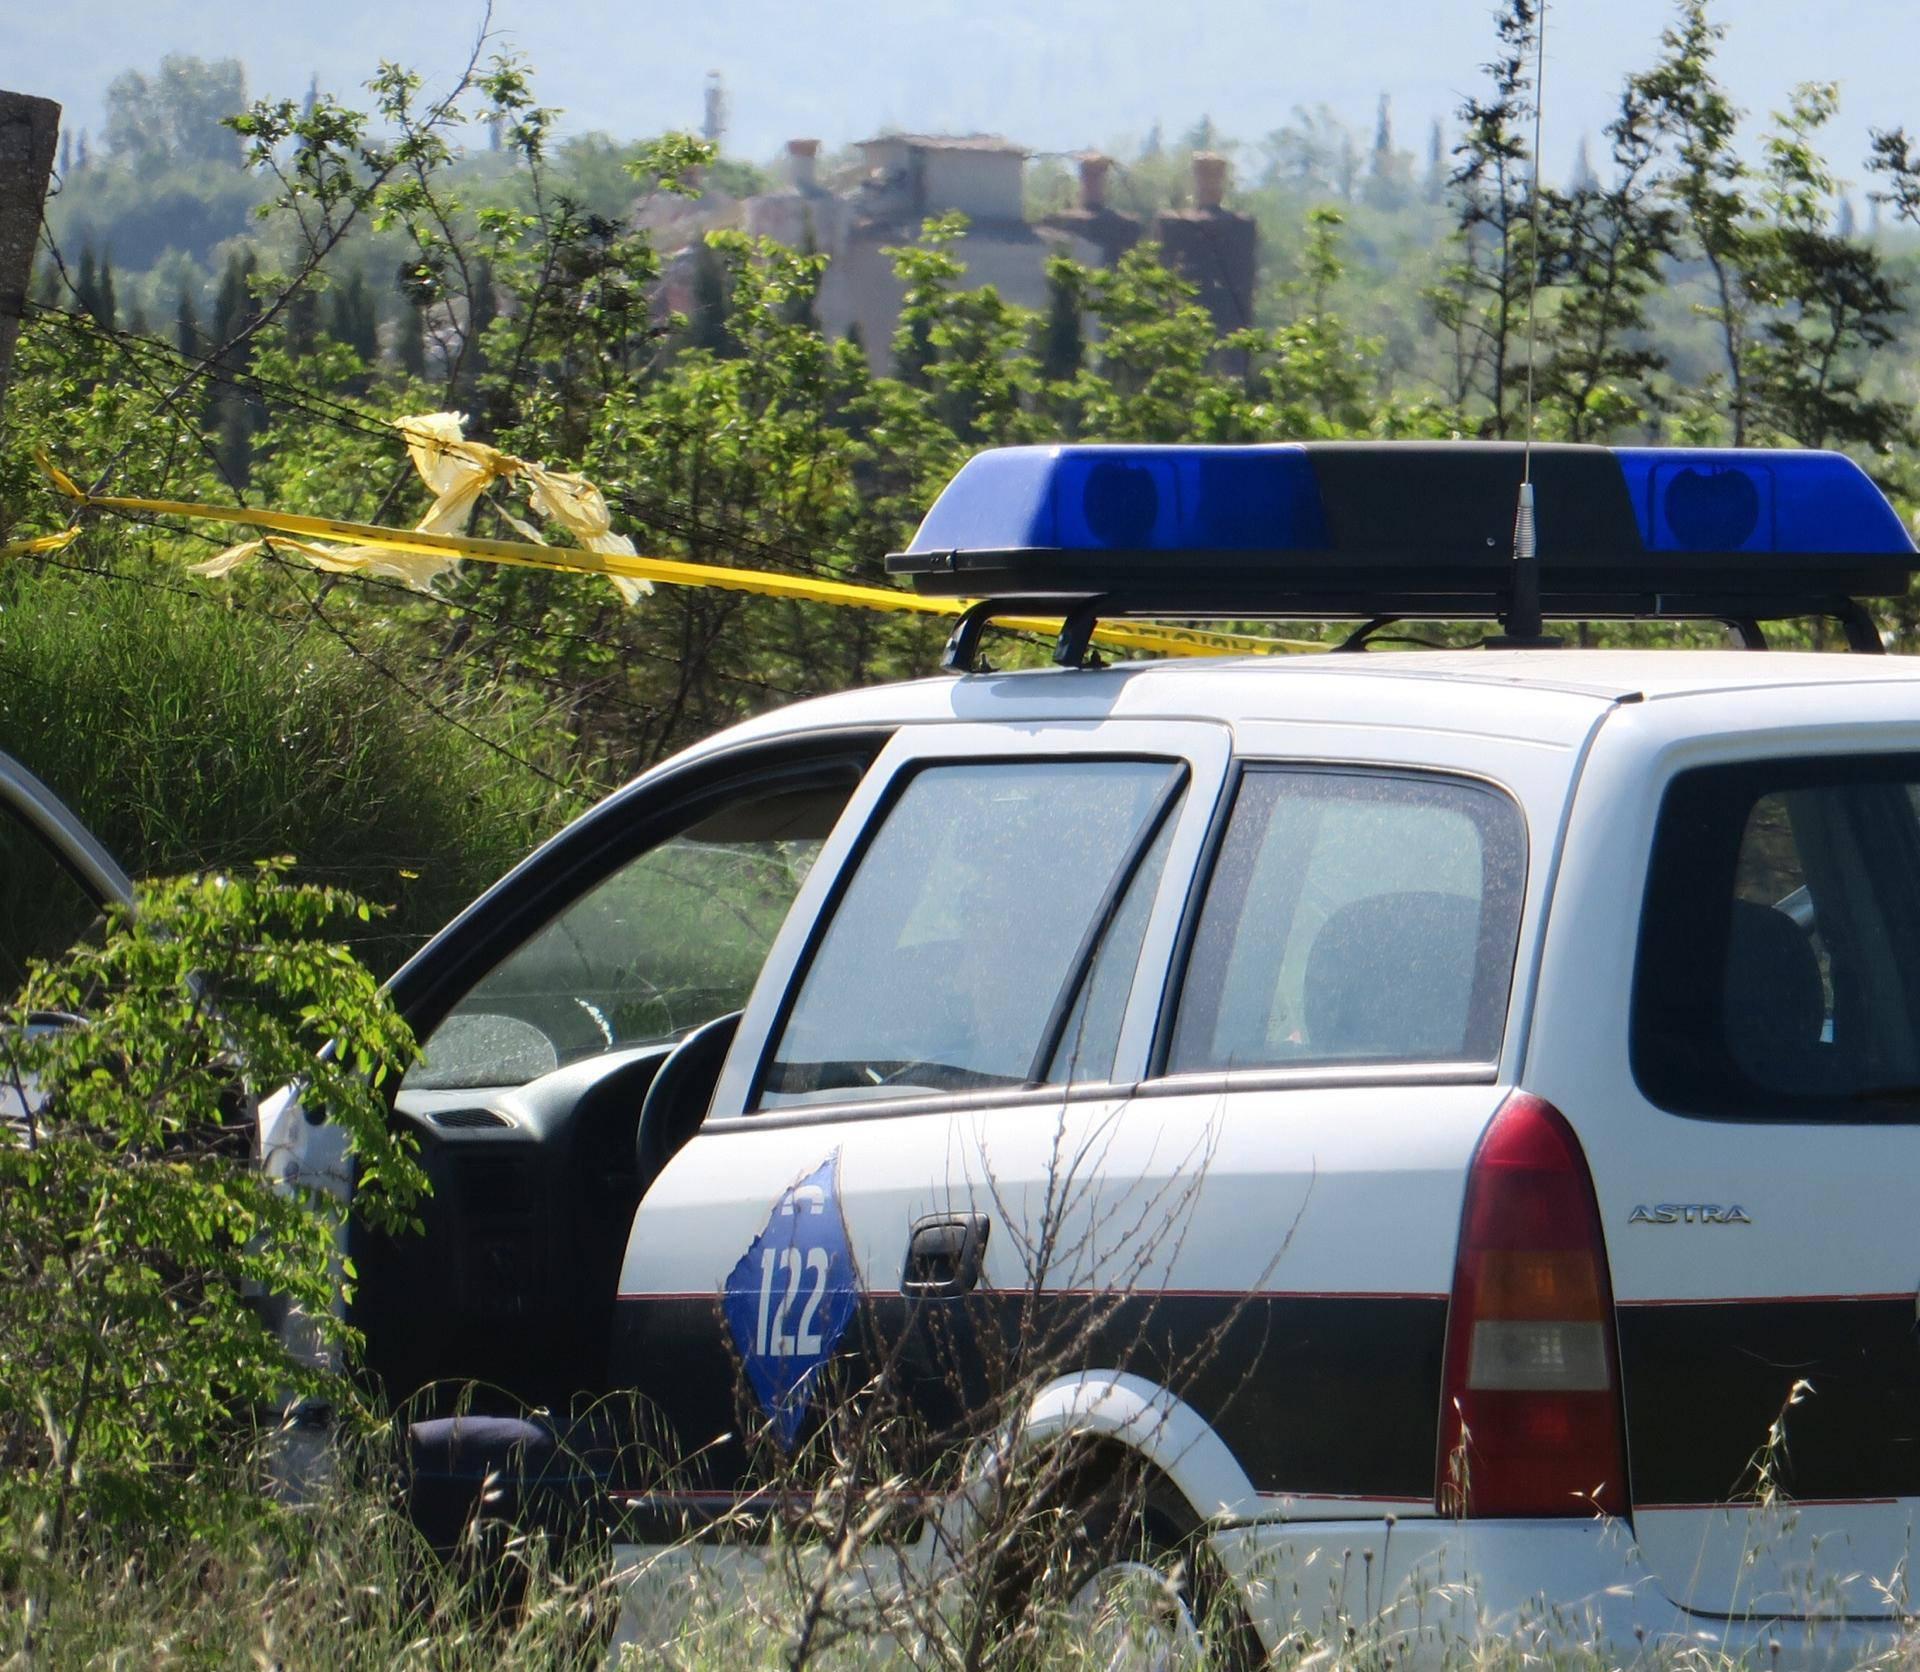 Ubili ilegalnog migranta kod Kulen Vakufa iz lovačkog oružja